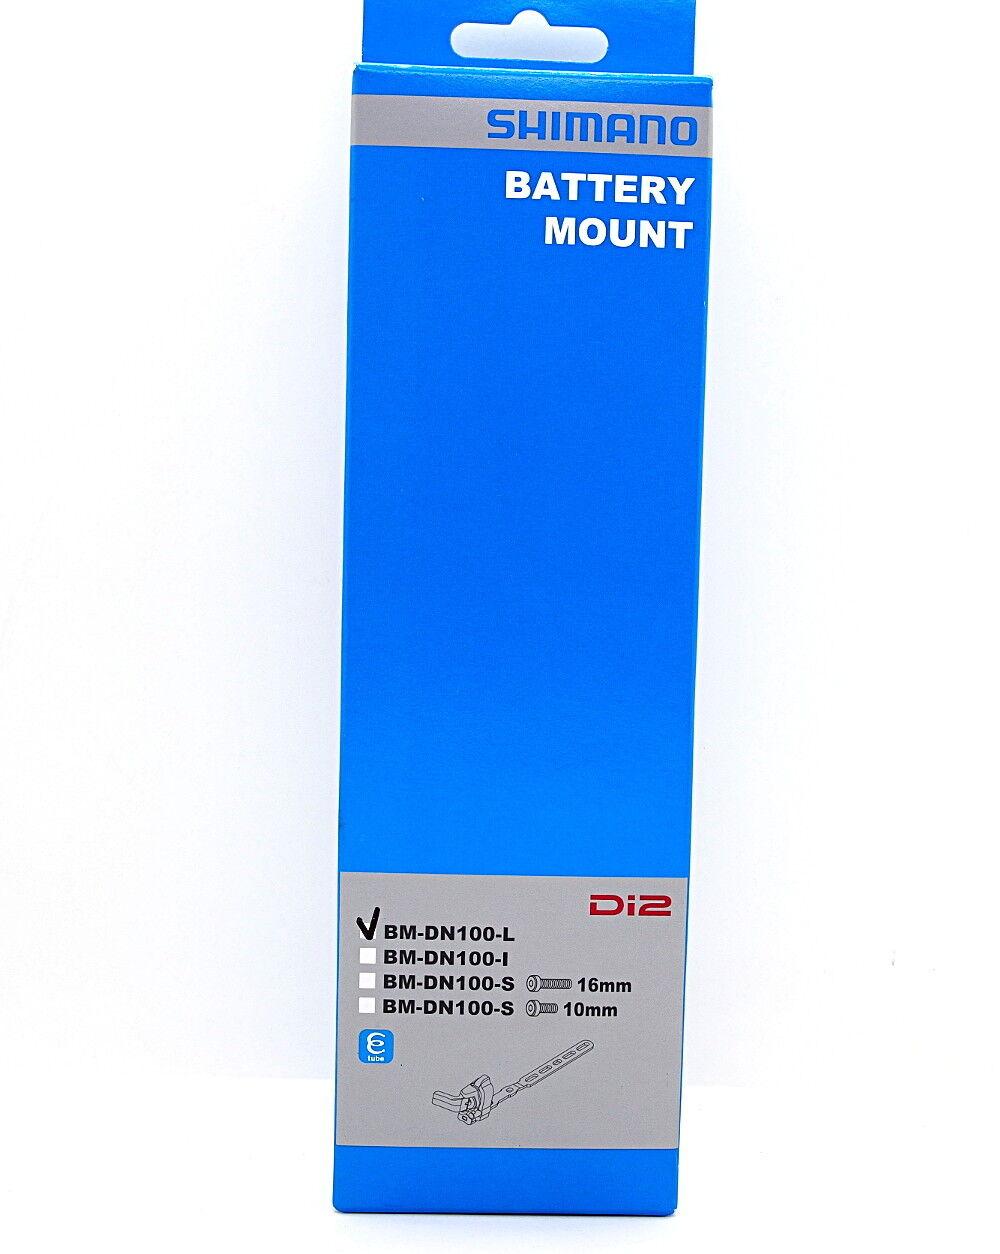 Shimano Dura Ace Di2 BM-DN100-L Batería Montaje Tamaño Grande (tipo externo)